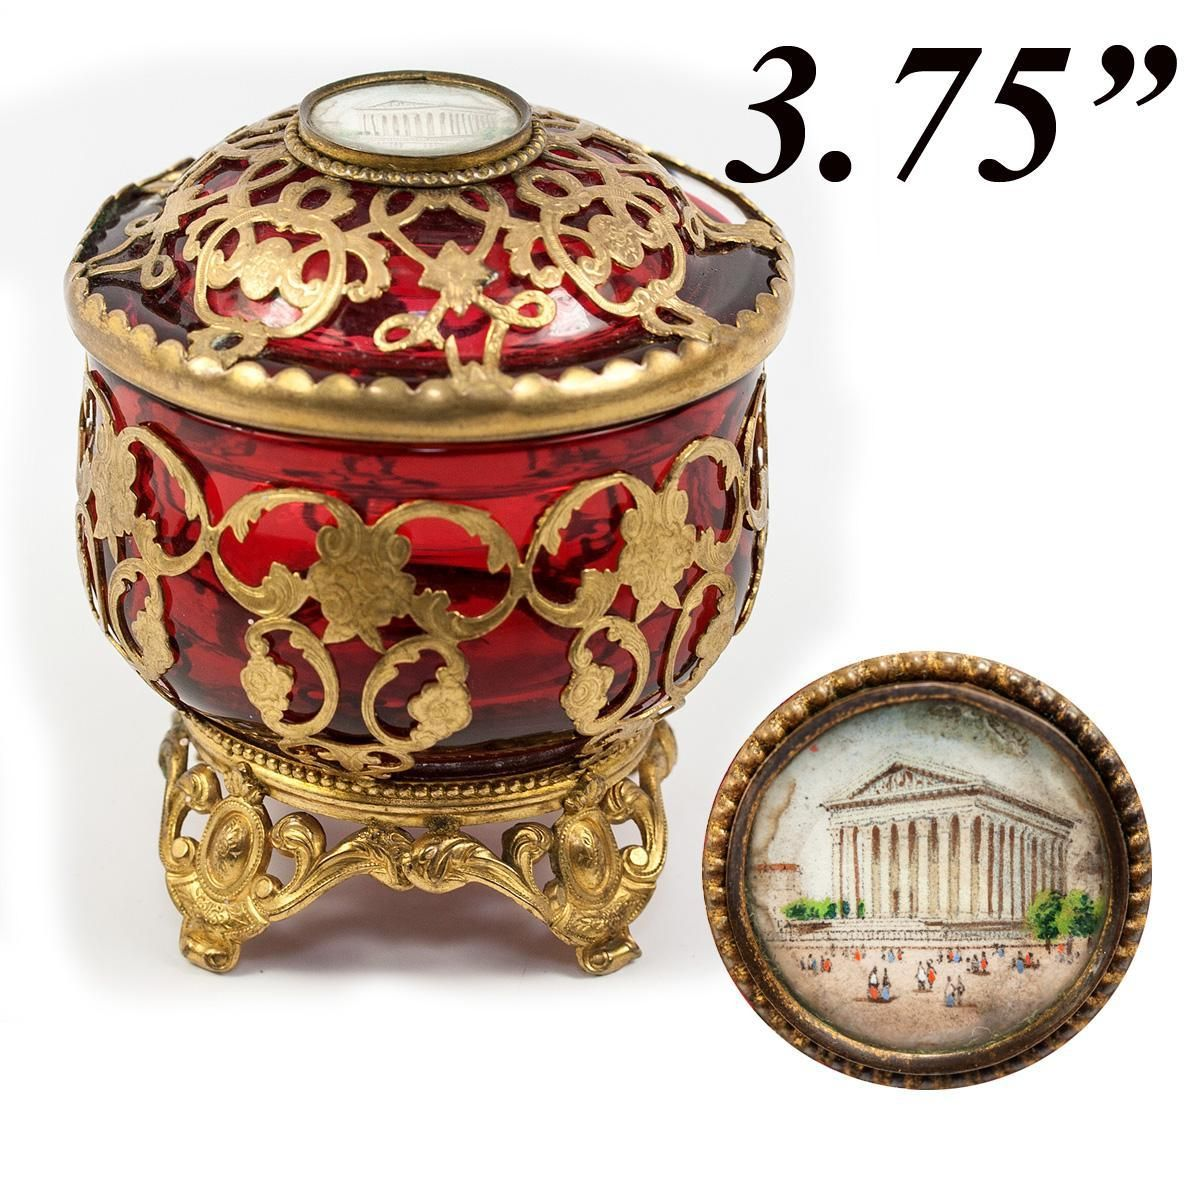 Antique French Cranberry Glass & Ormolu Powder Jar